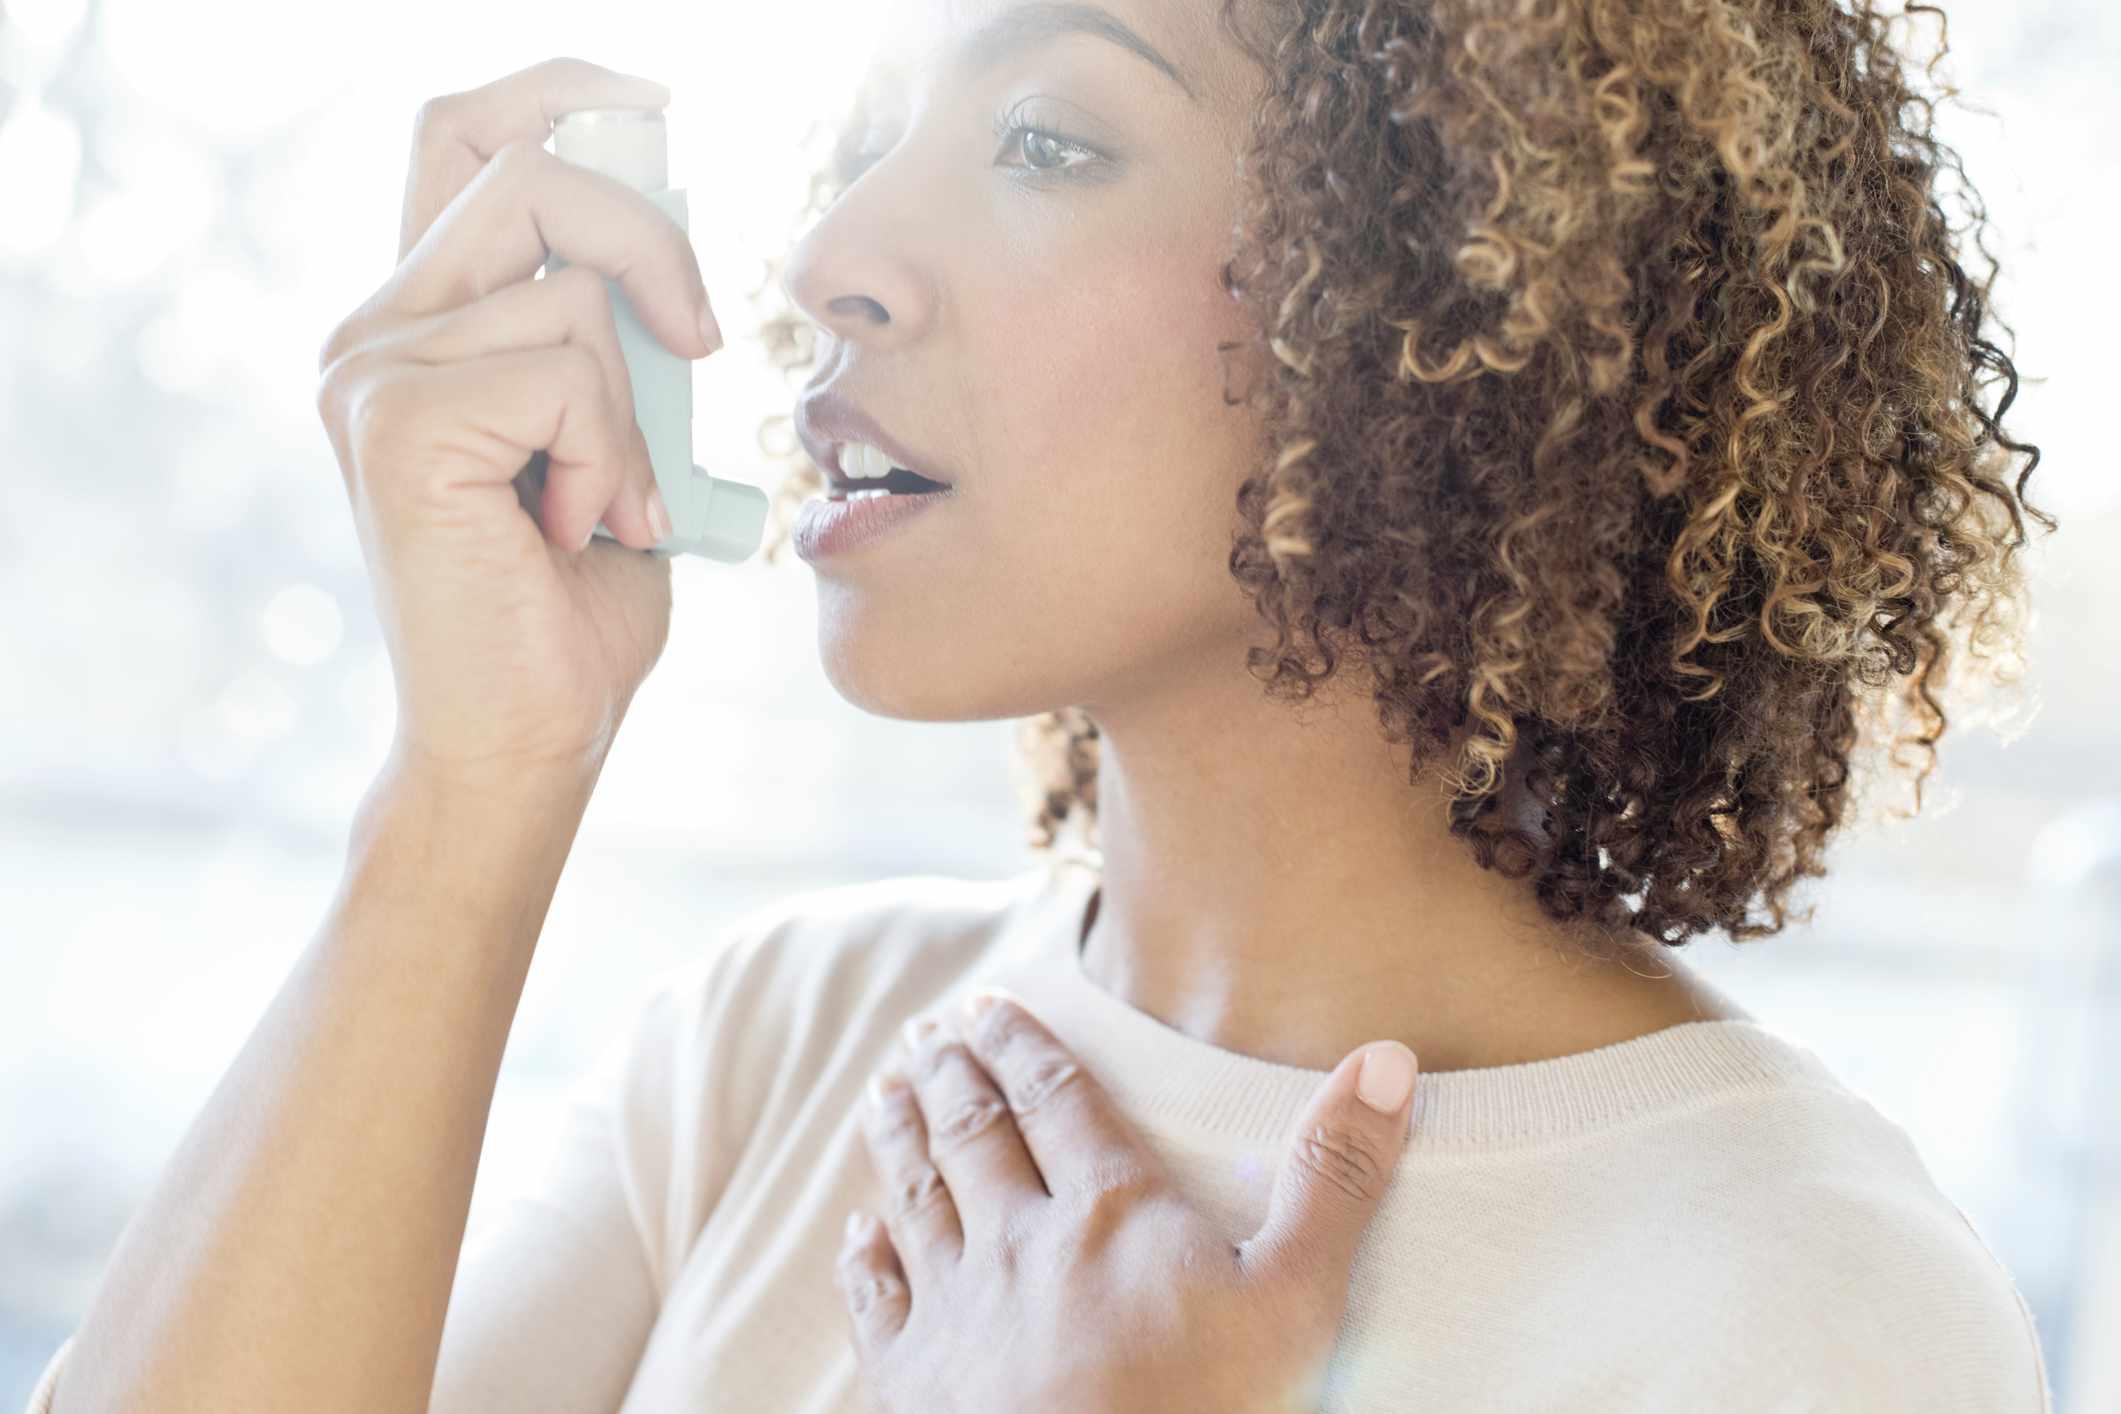 Mid adult woman using inhaler - stock photo Mid adult woman using inhaler.